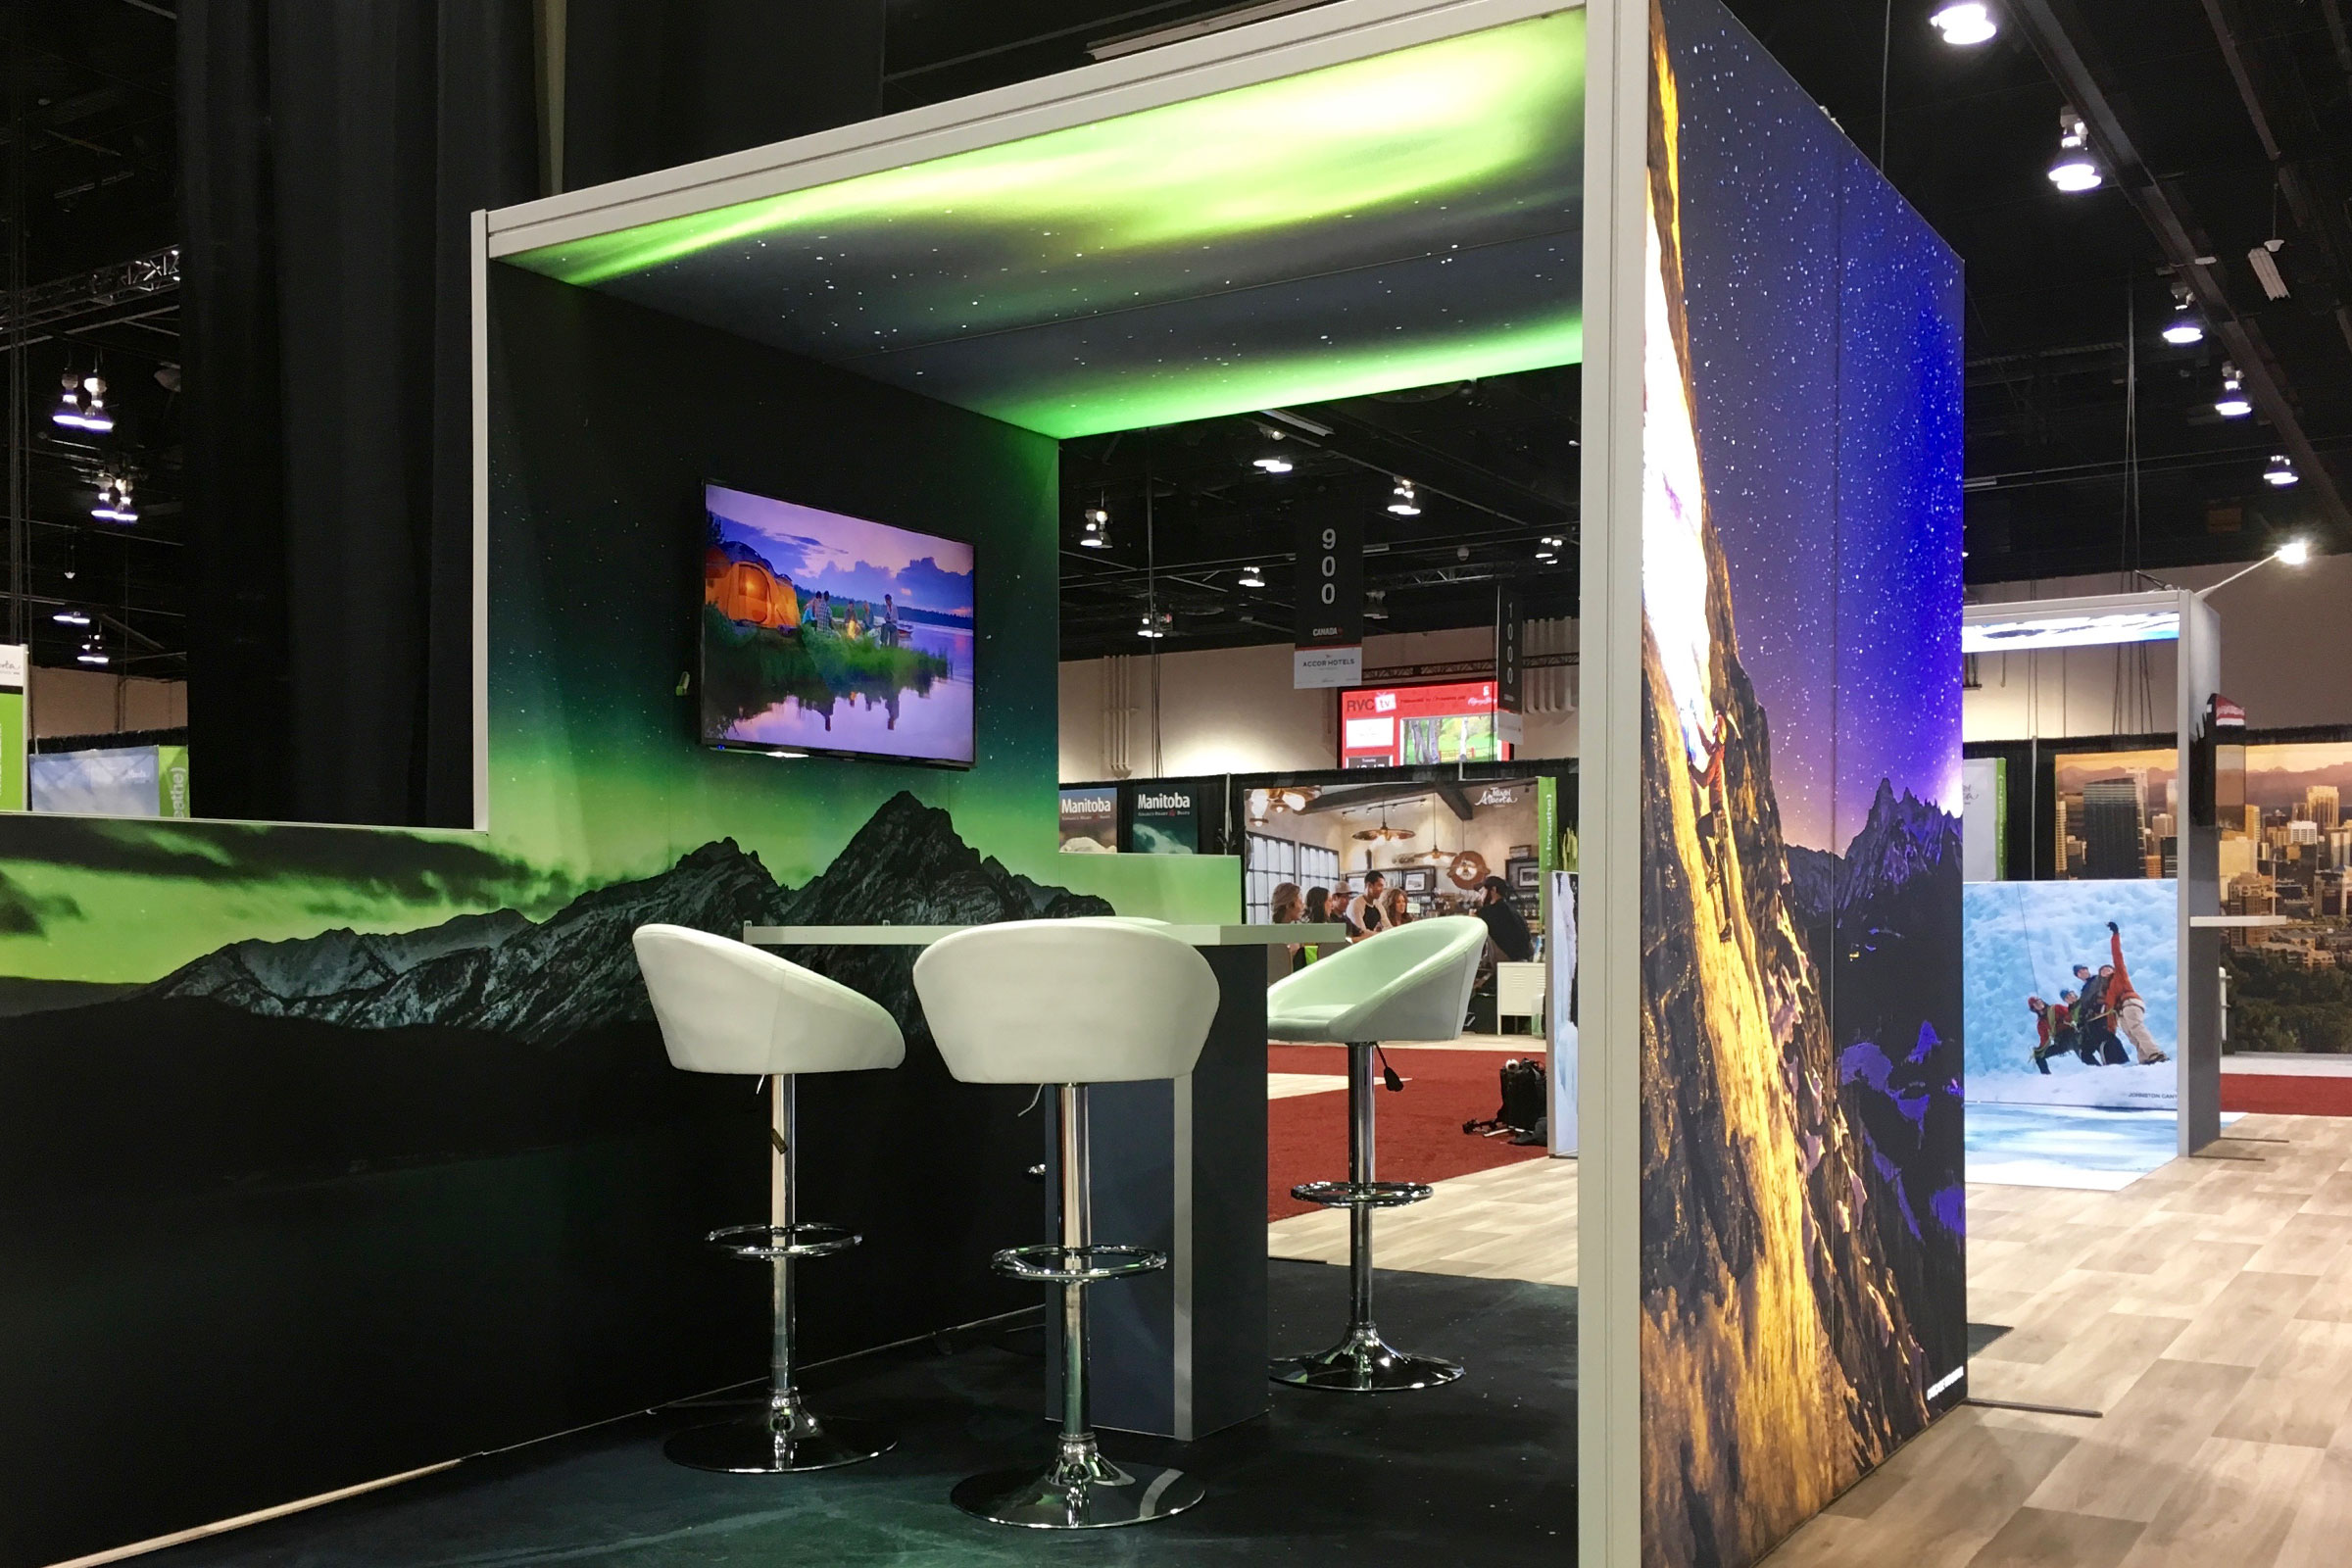 H-line 24' x 58' Exhibit - Travel Alberta RVC2017